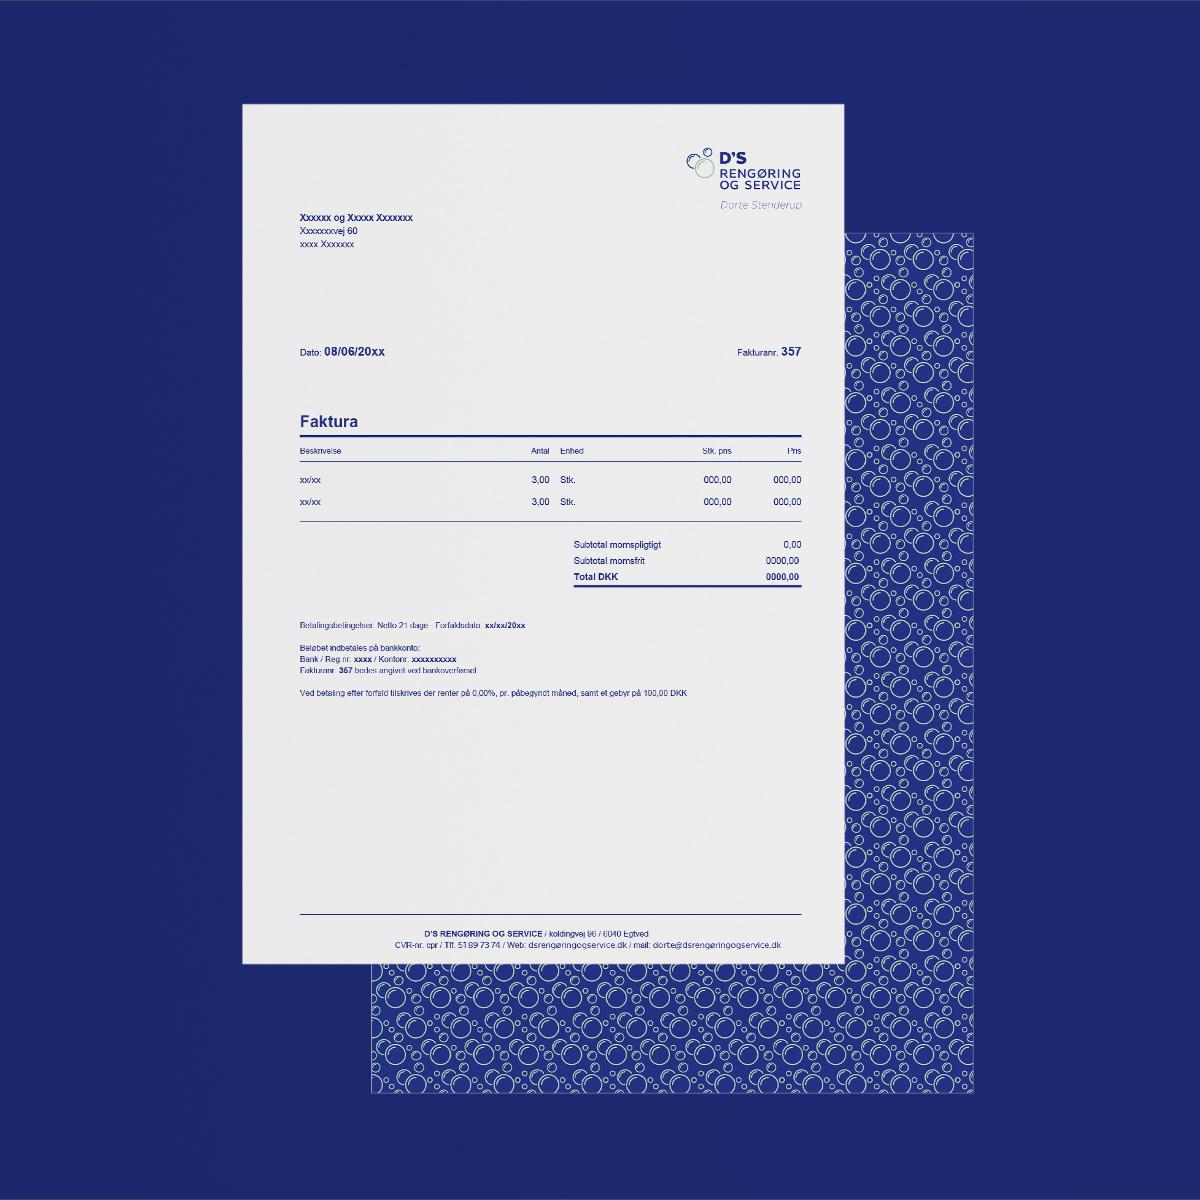 DS-Rengøring-&-Service-Brevpapir-opsat